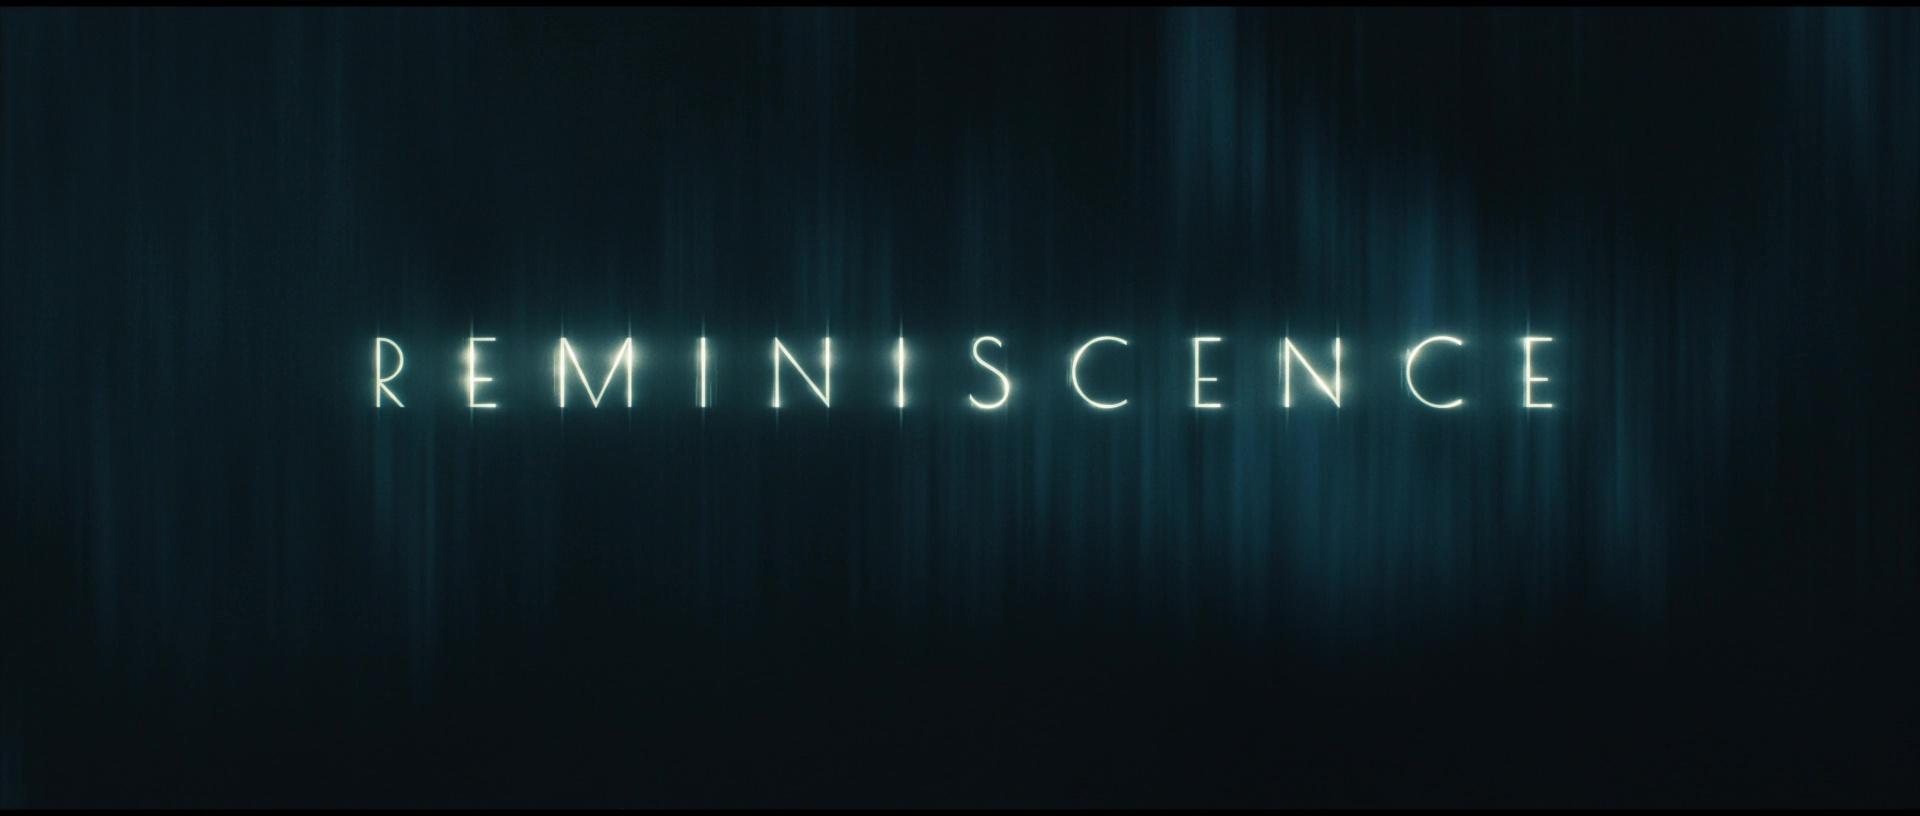 Reminiscencia (2021) 1080p 60FPS WEB-DL Latino